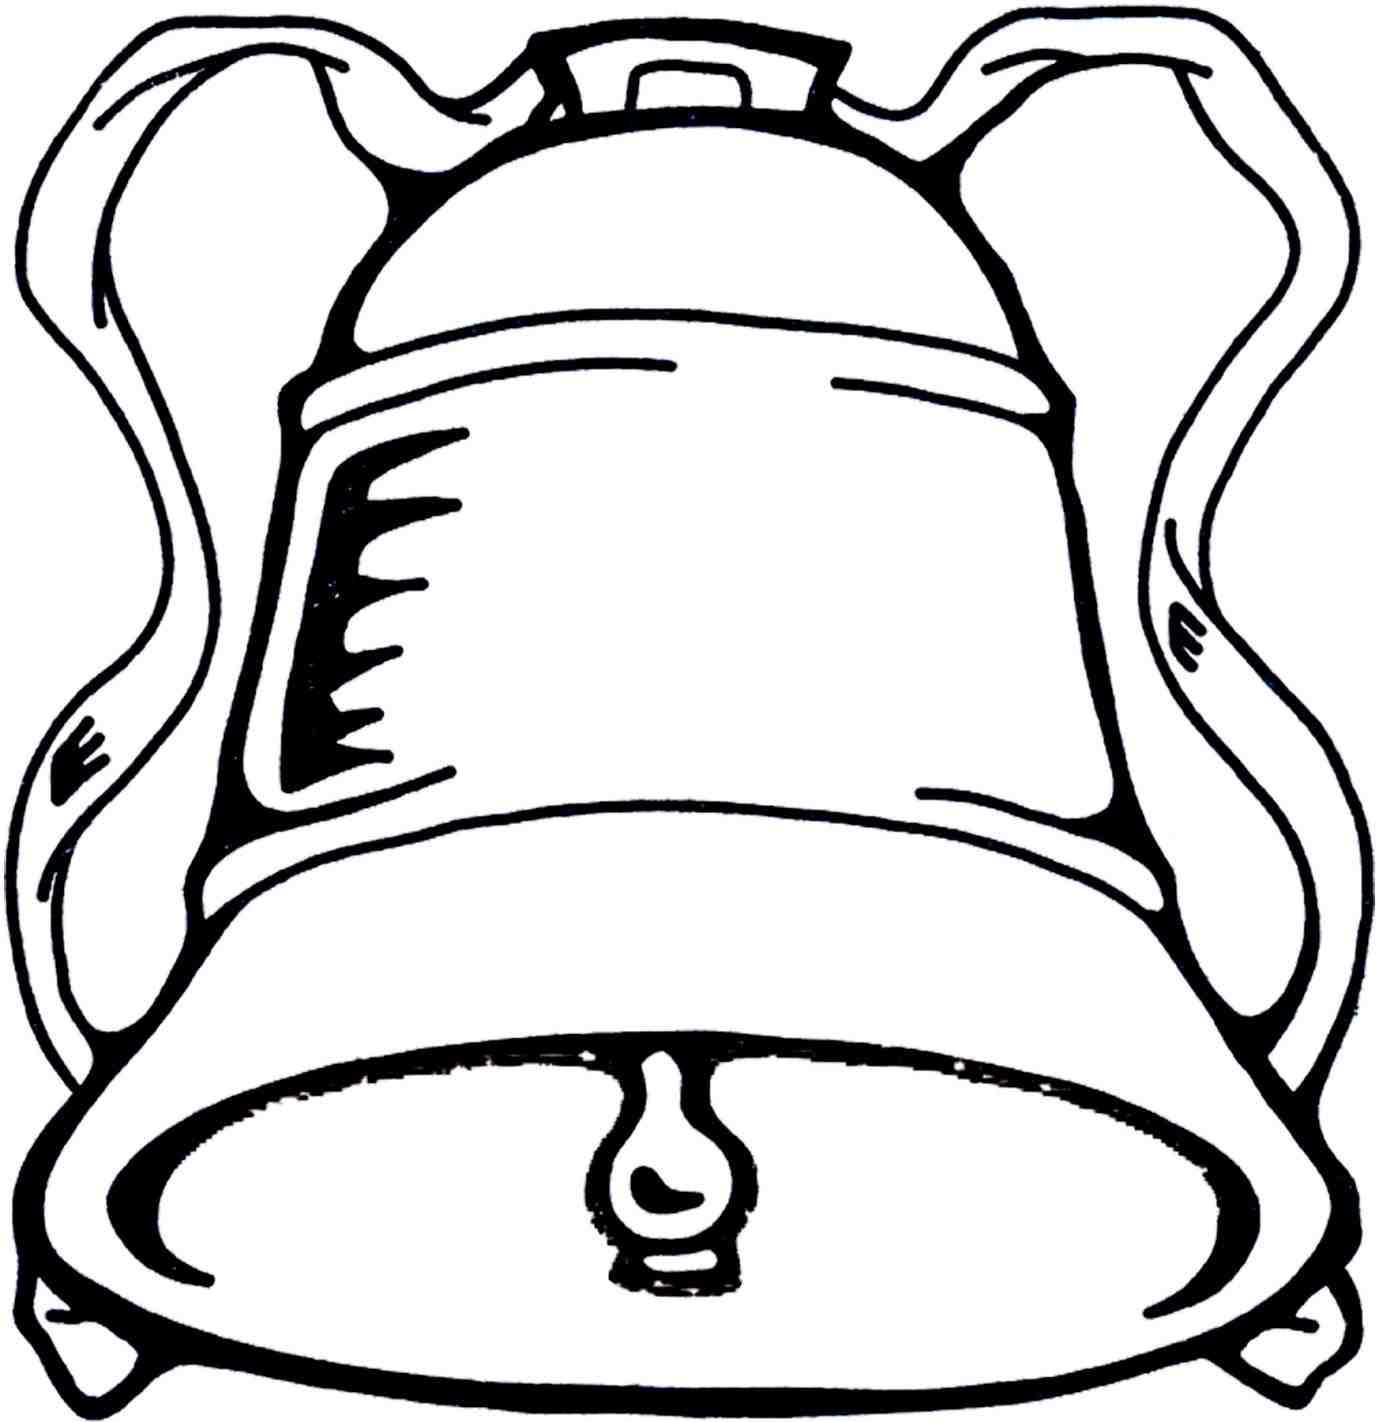 1379x1422 Christmas Bells Clip Art Black And White Cheminee.website